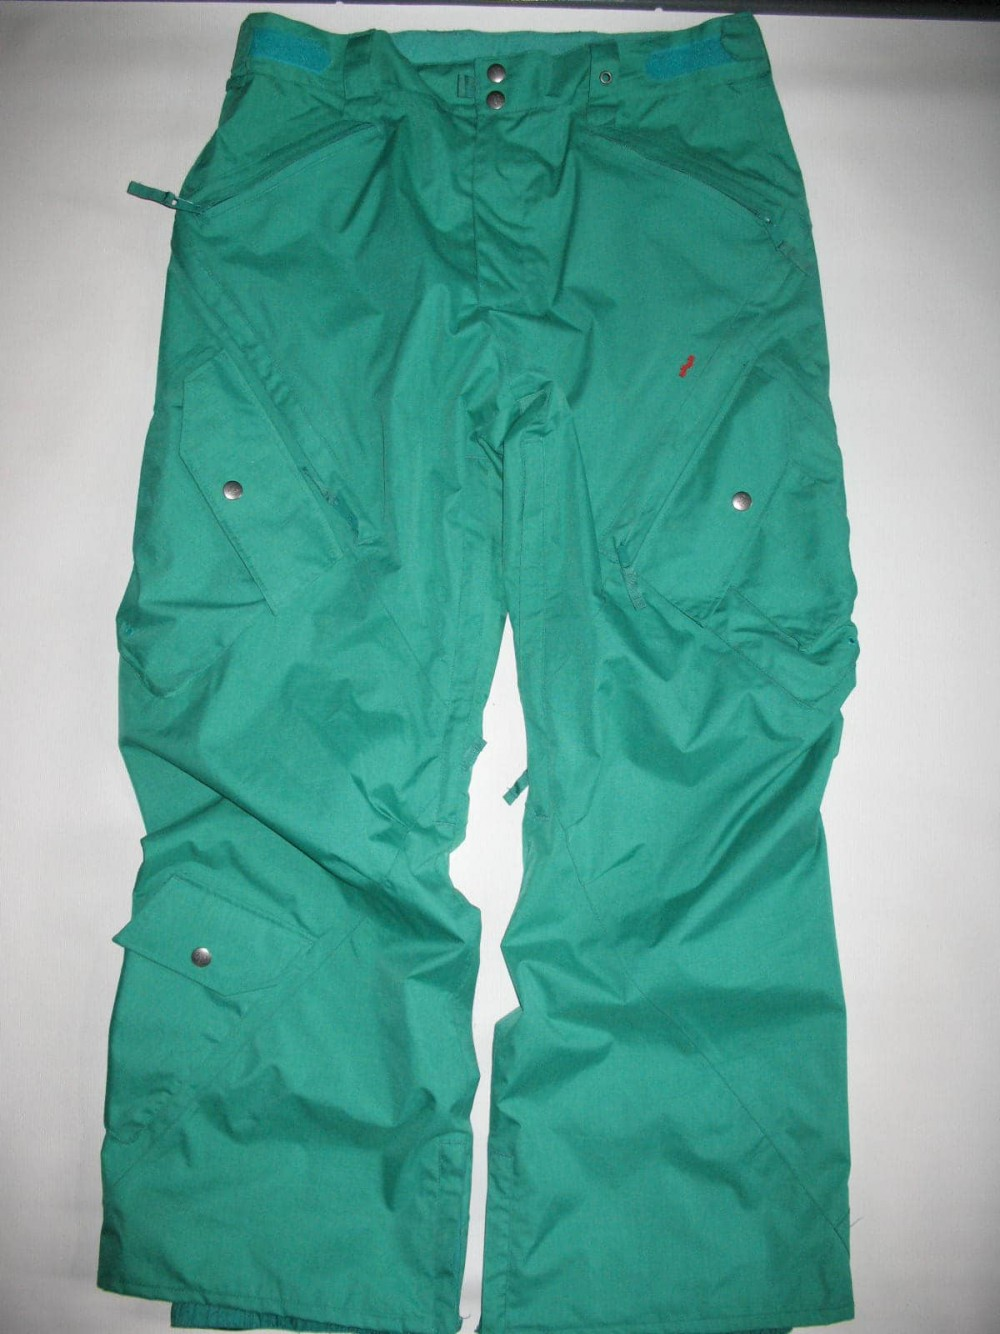 Штаны FOURSQUARE q snowboard pants (размер XL) - 1